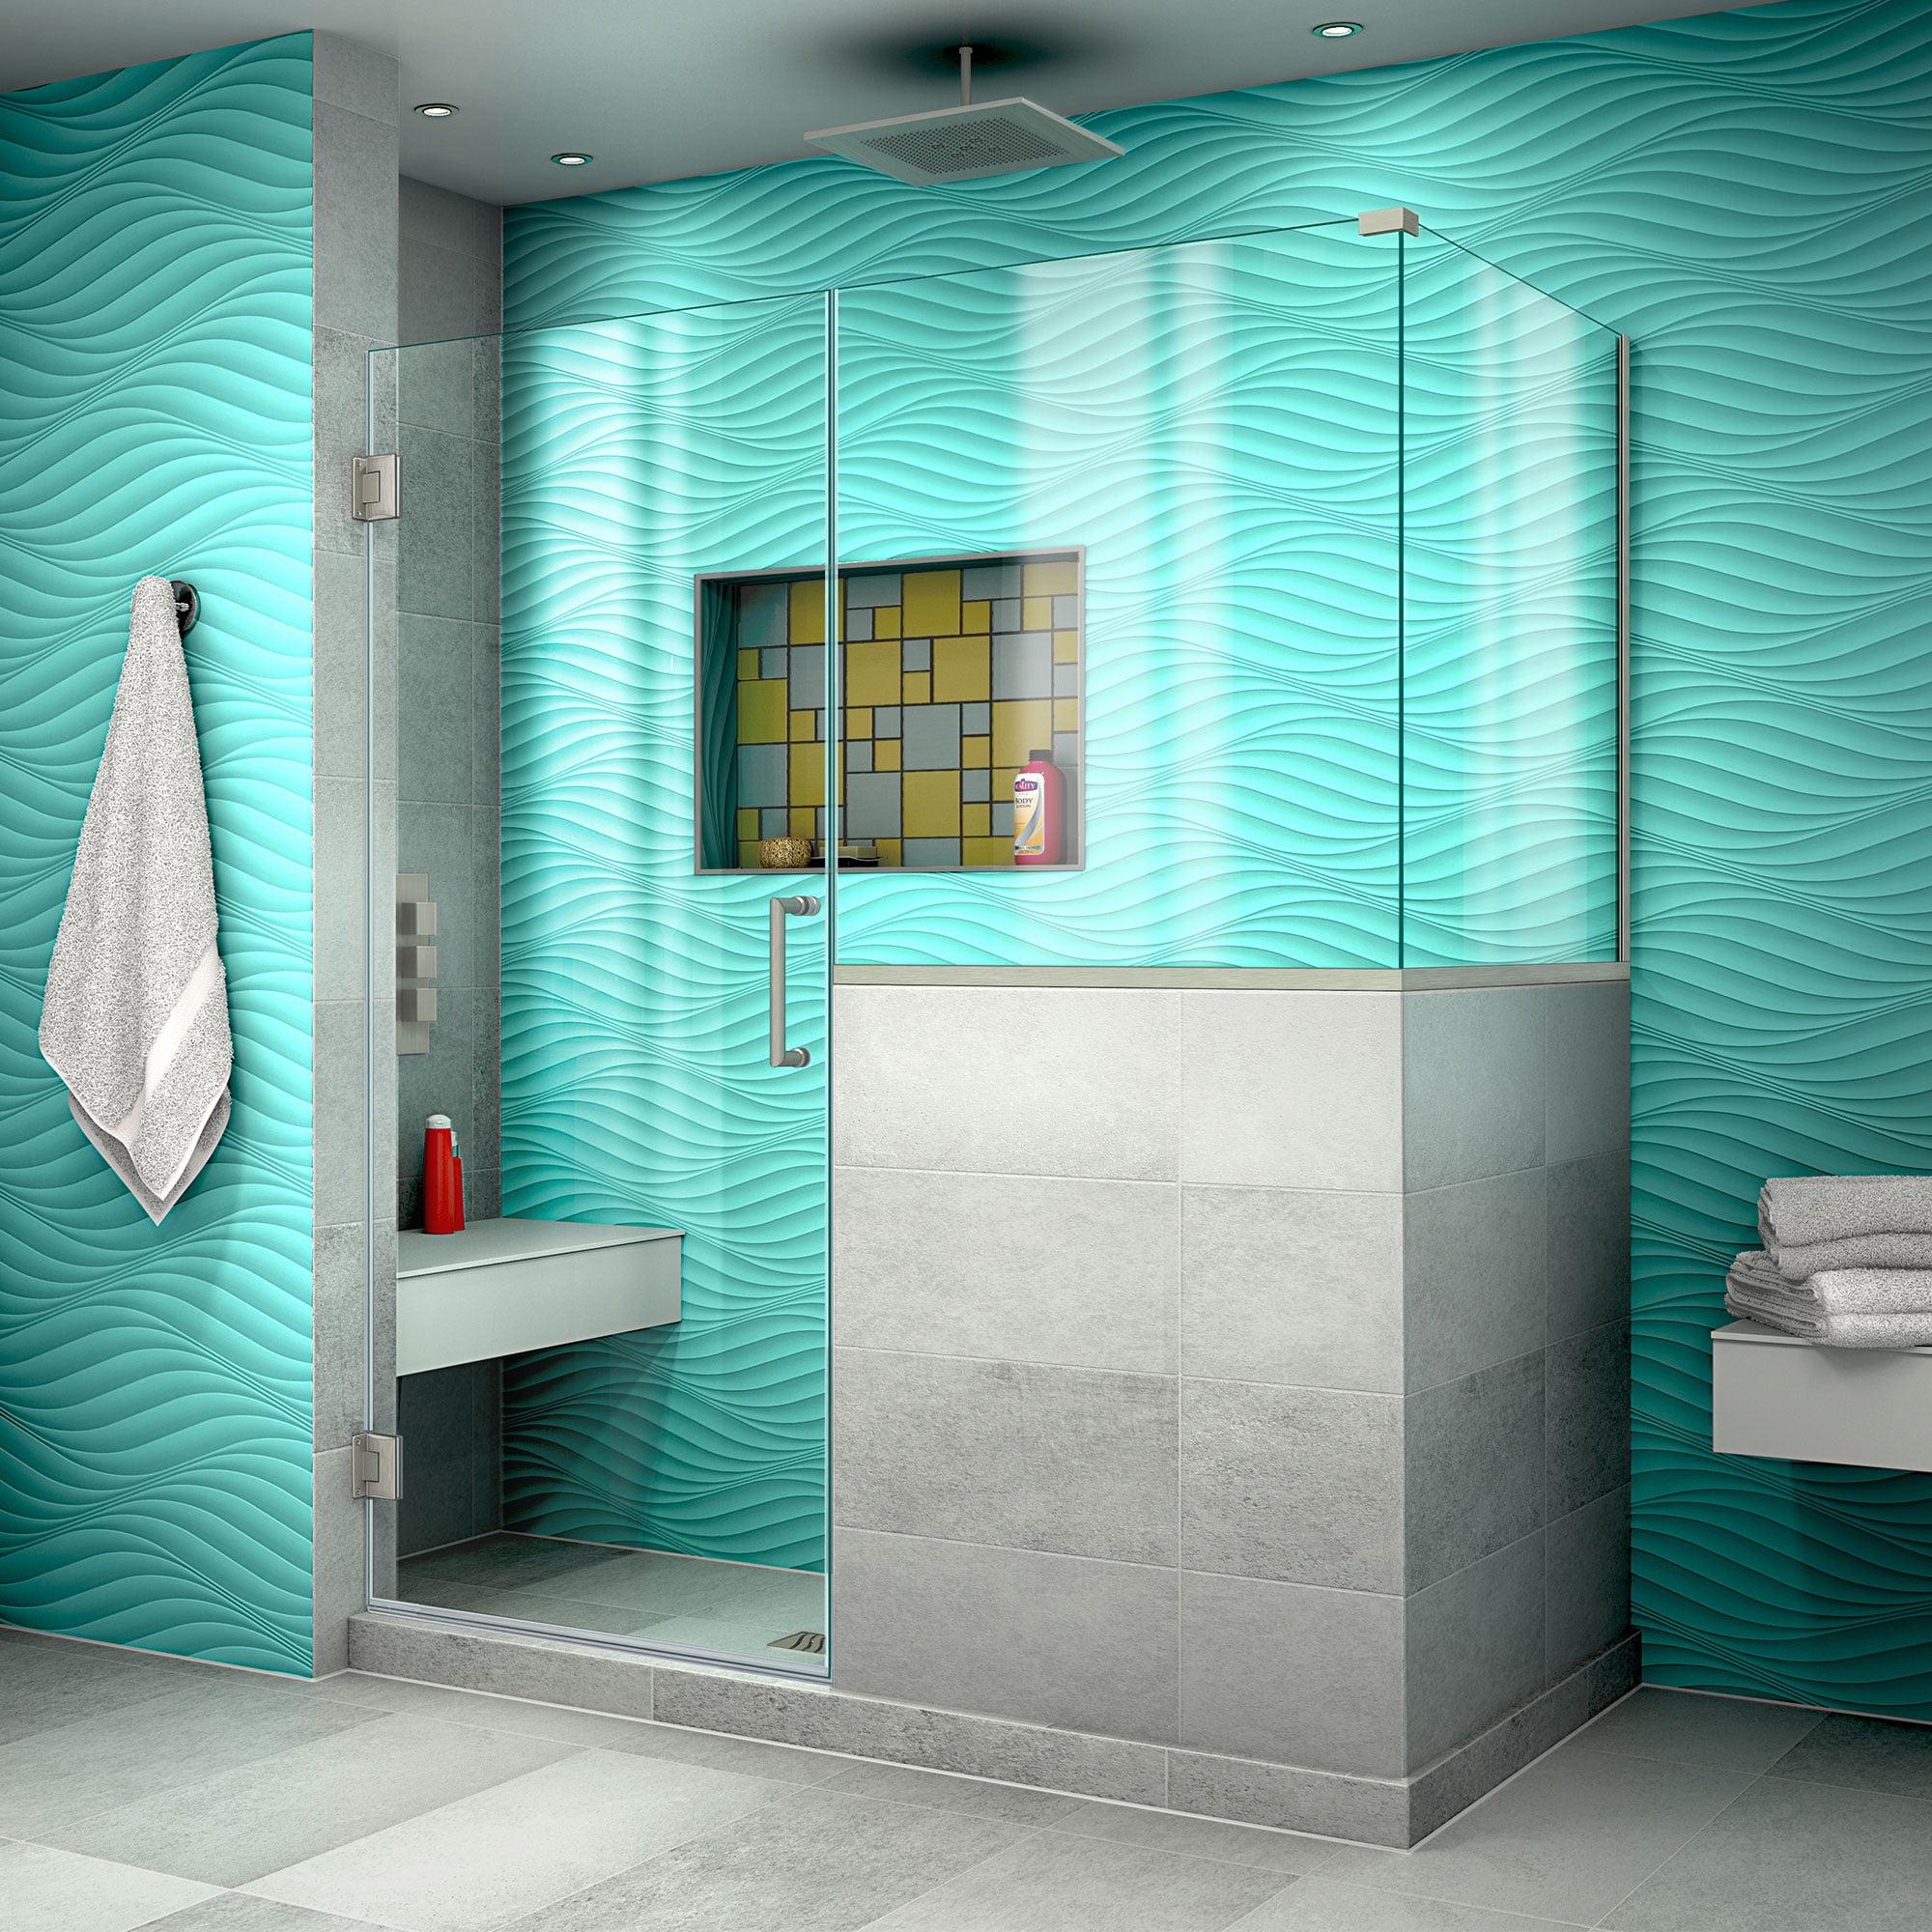 DreamLine Unidoor Plus 54 in. W x 30 3/8 in. D x 72 in. H Frameless Hinged Shower Enclosure in Brushed Nickel